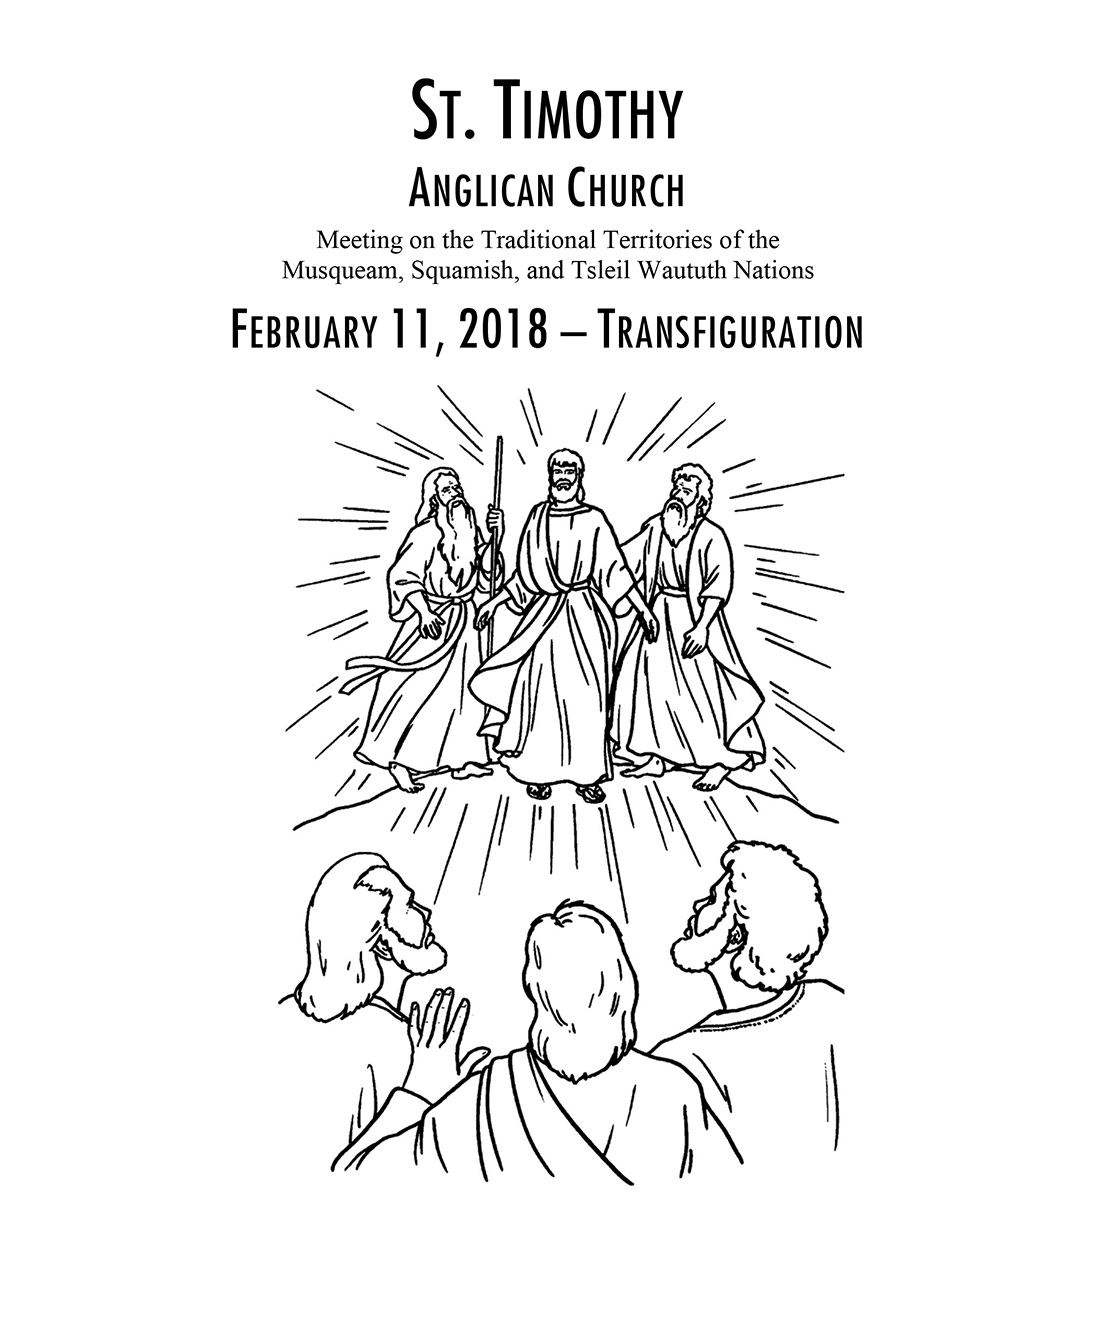 Bulletin: February 11, 2018